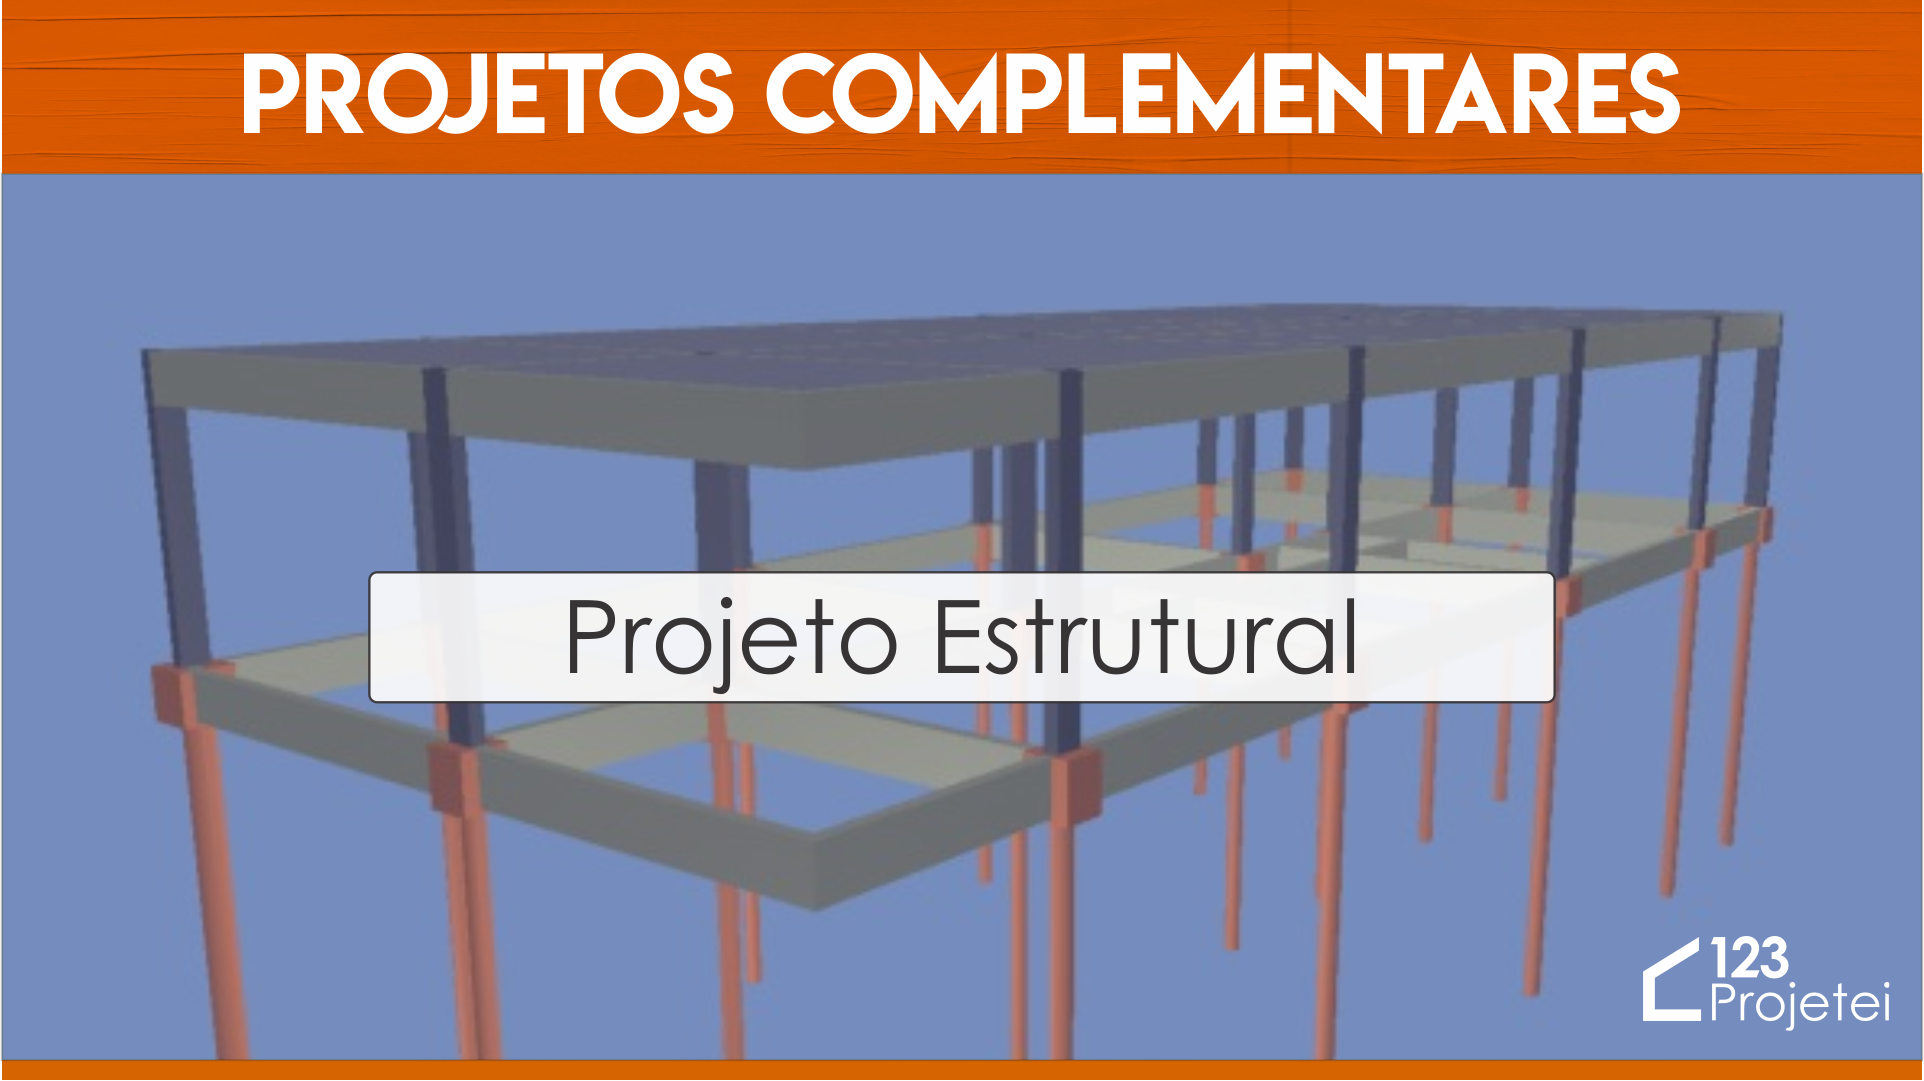 Projeto Estrutural: Conheça os Projetos Complementares